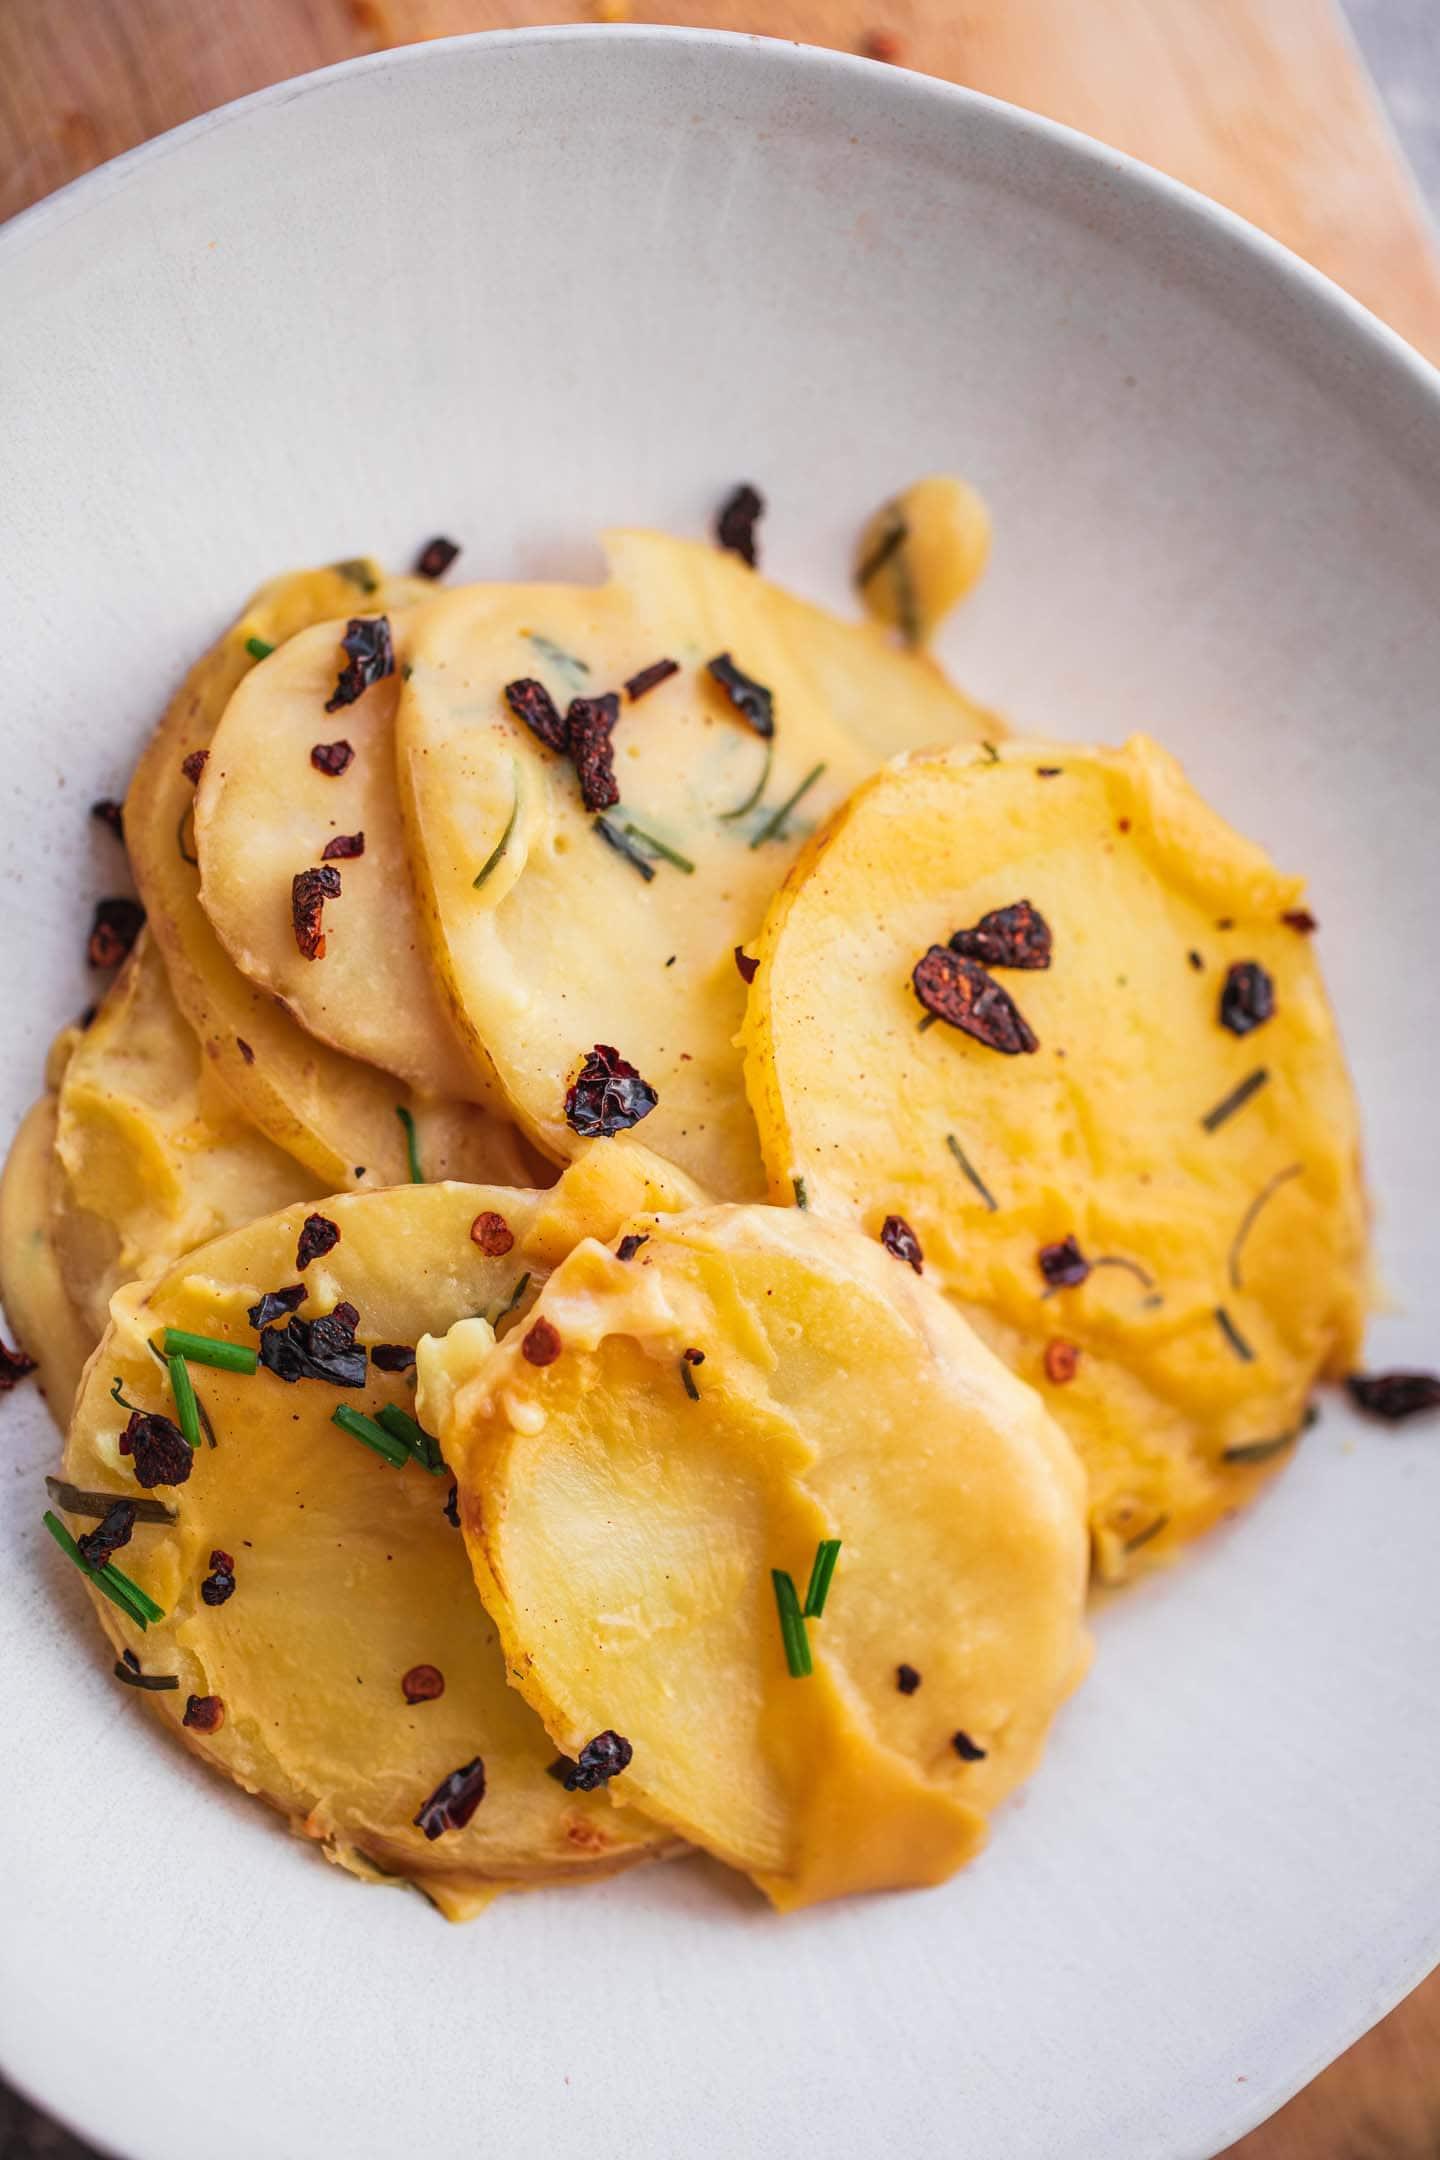 Vegan scalloped potatoes nut-free